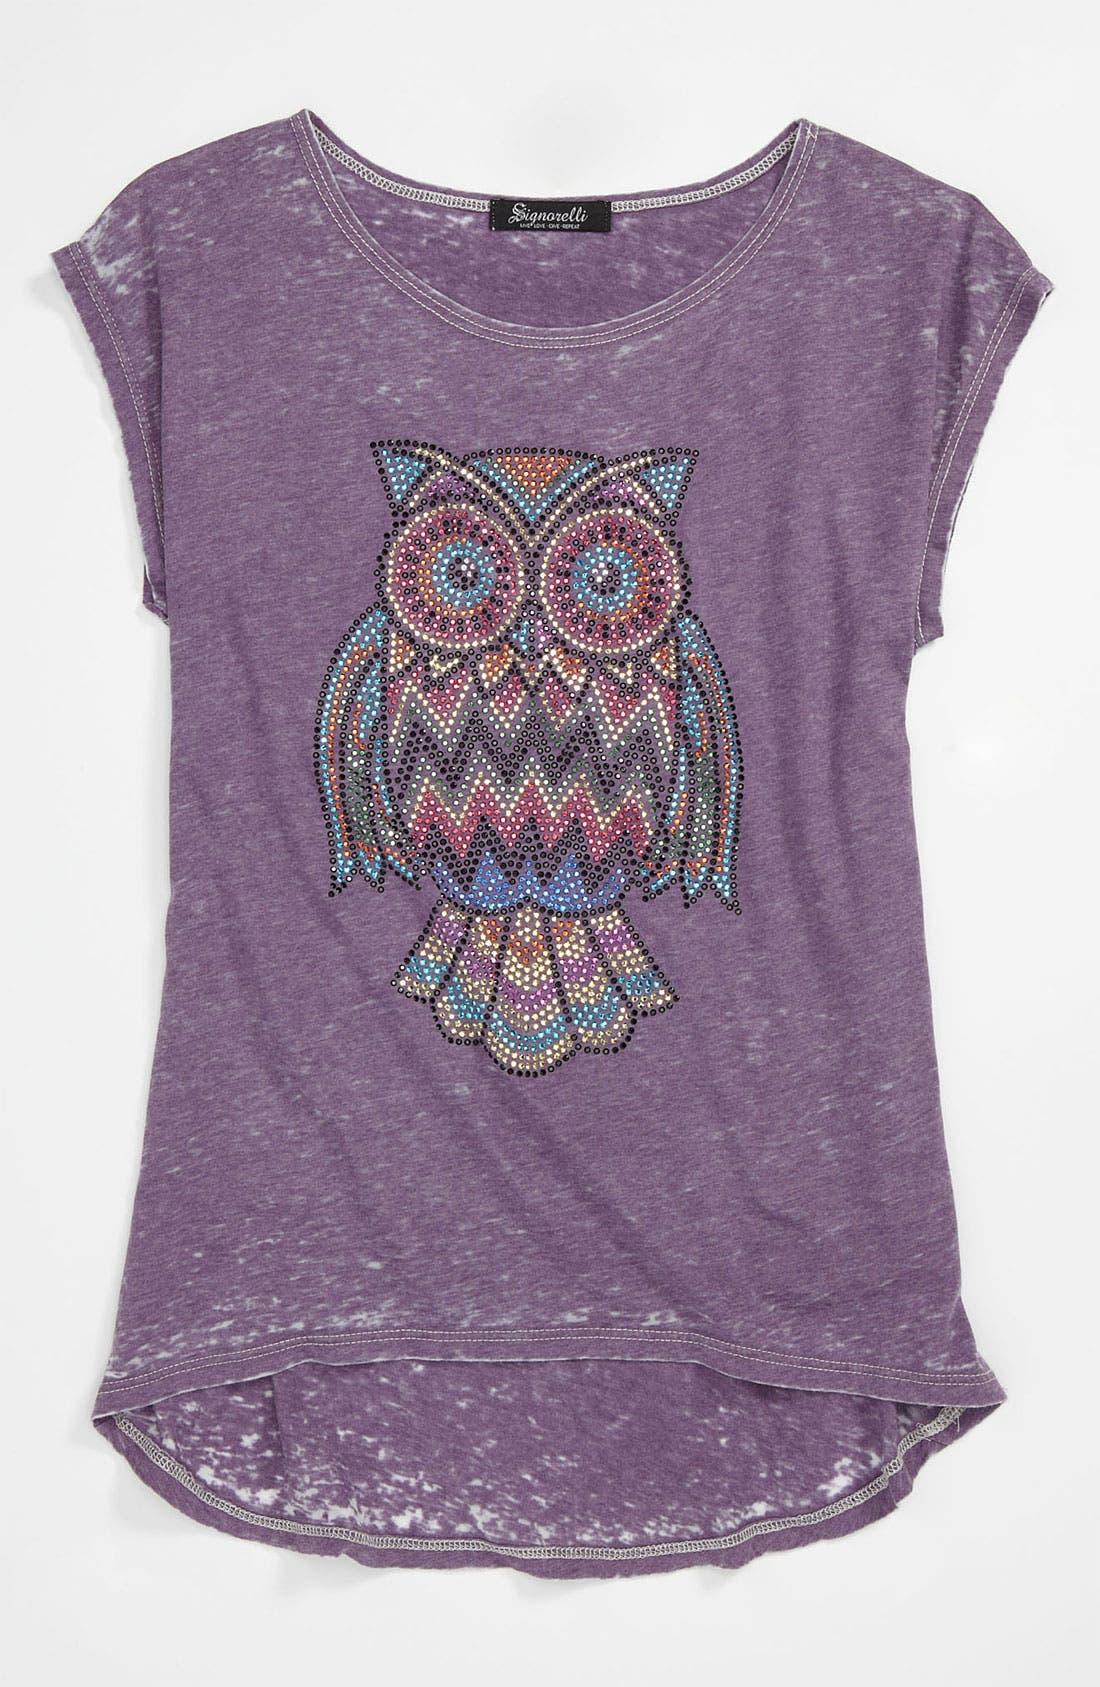 Alternate Image 1 Selected - Signorelli 'Owl' Tee (Big Girls)